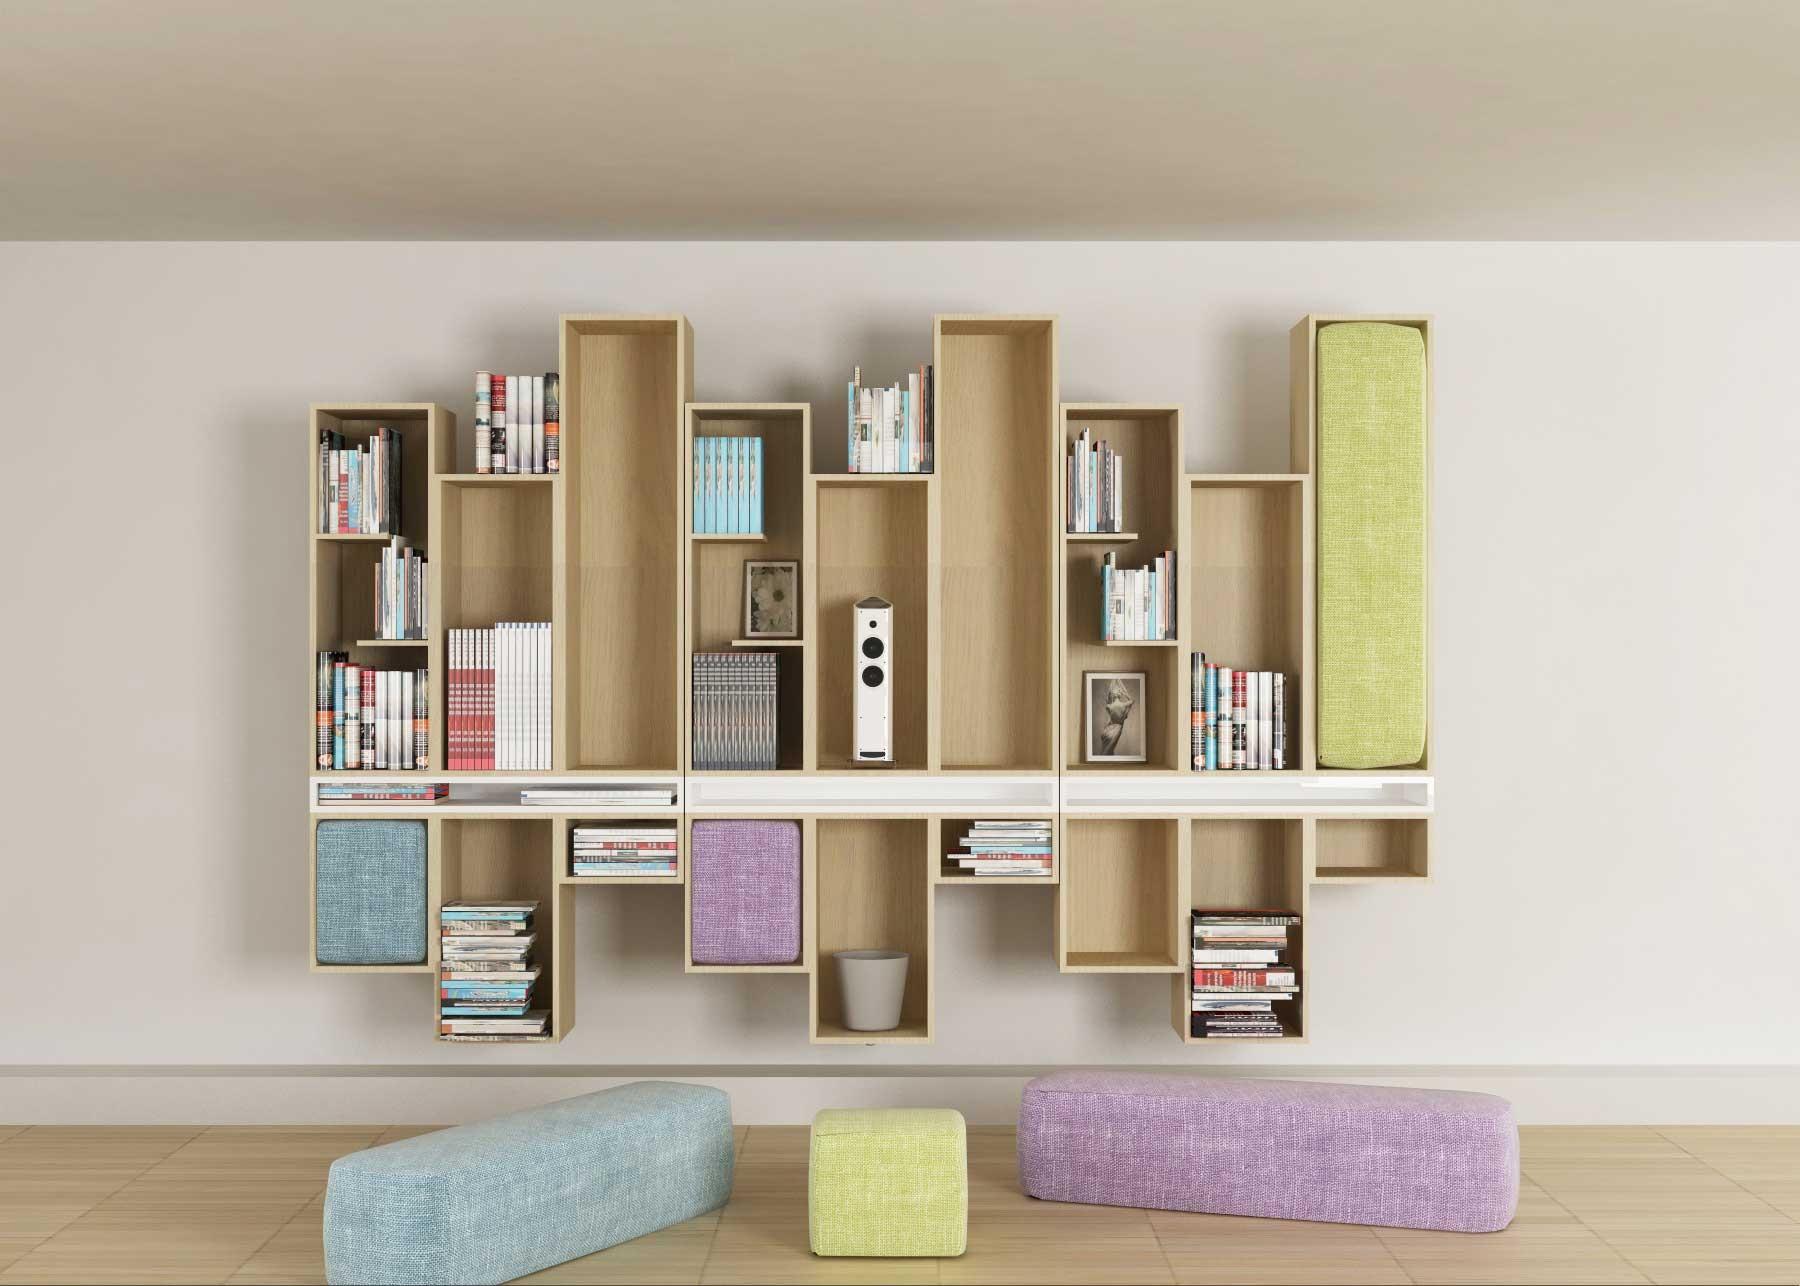 Ex mark sistema modulare for Libreria modulare